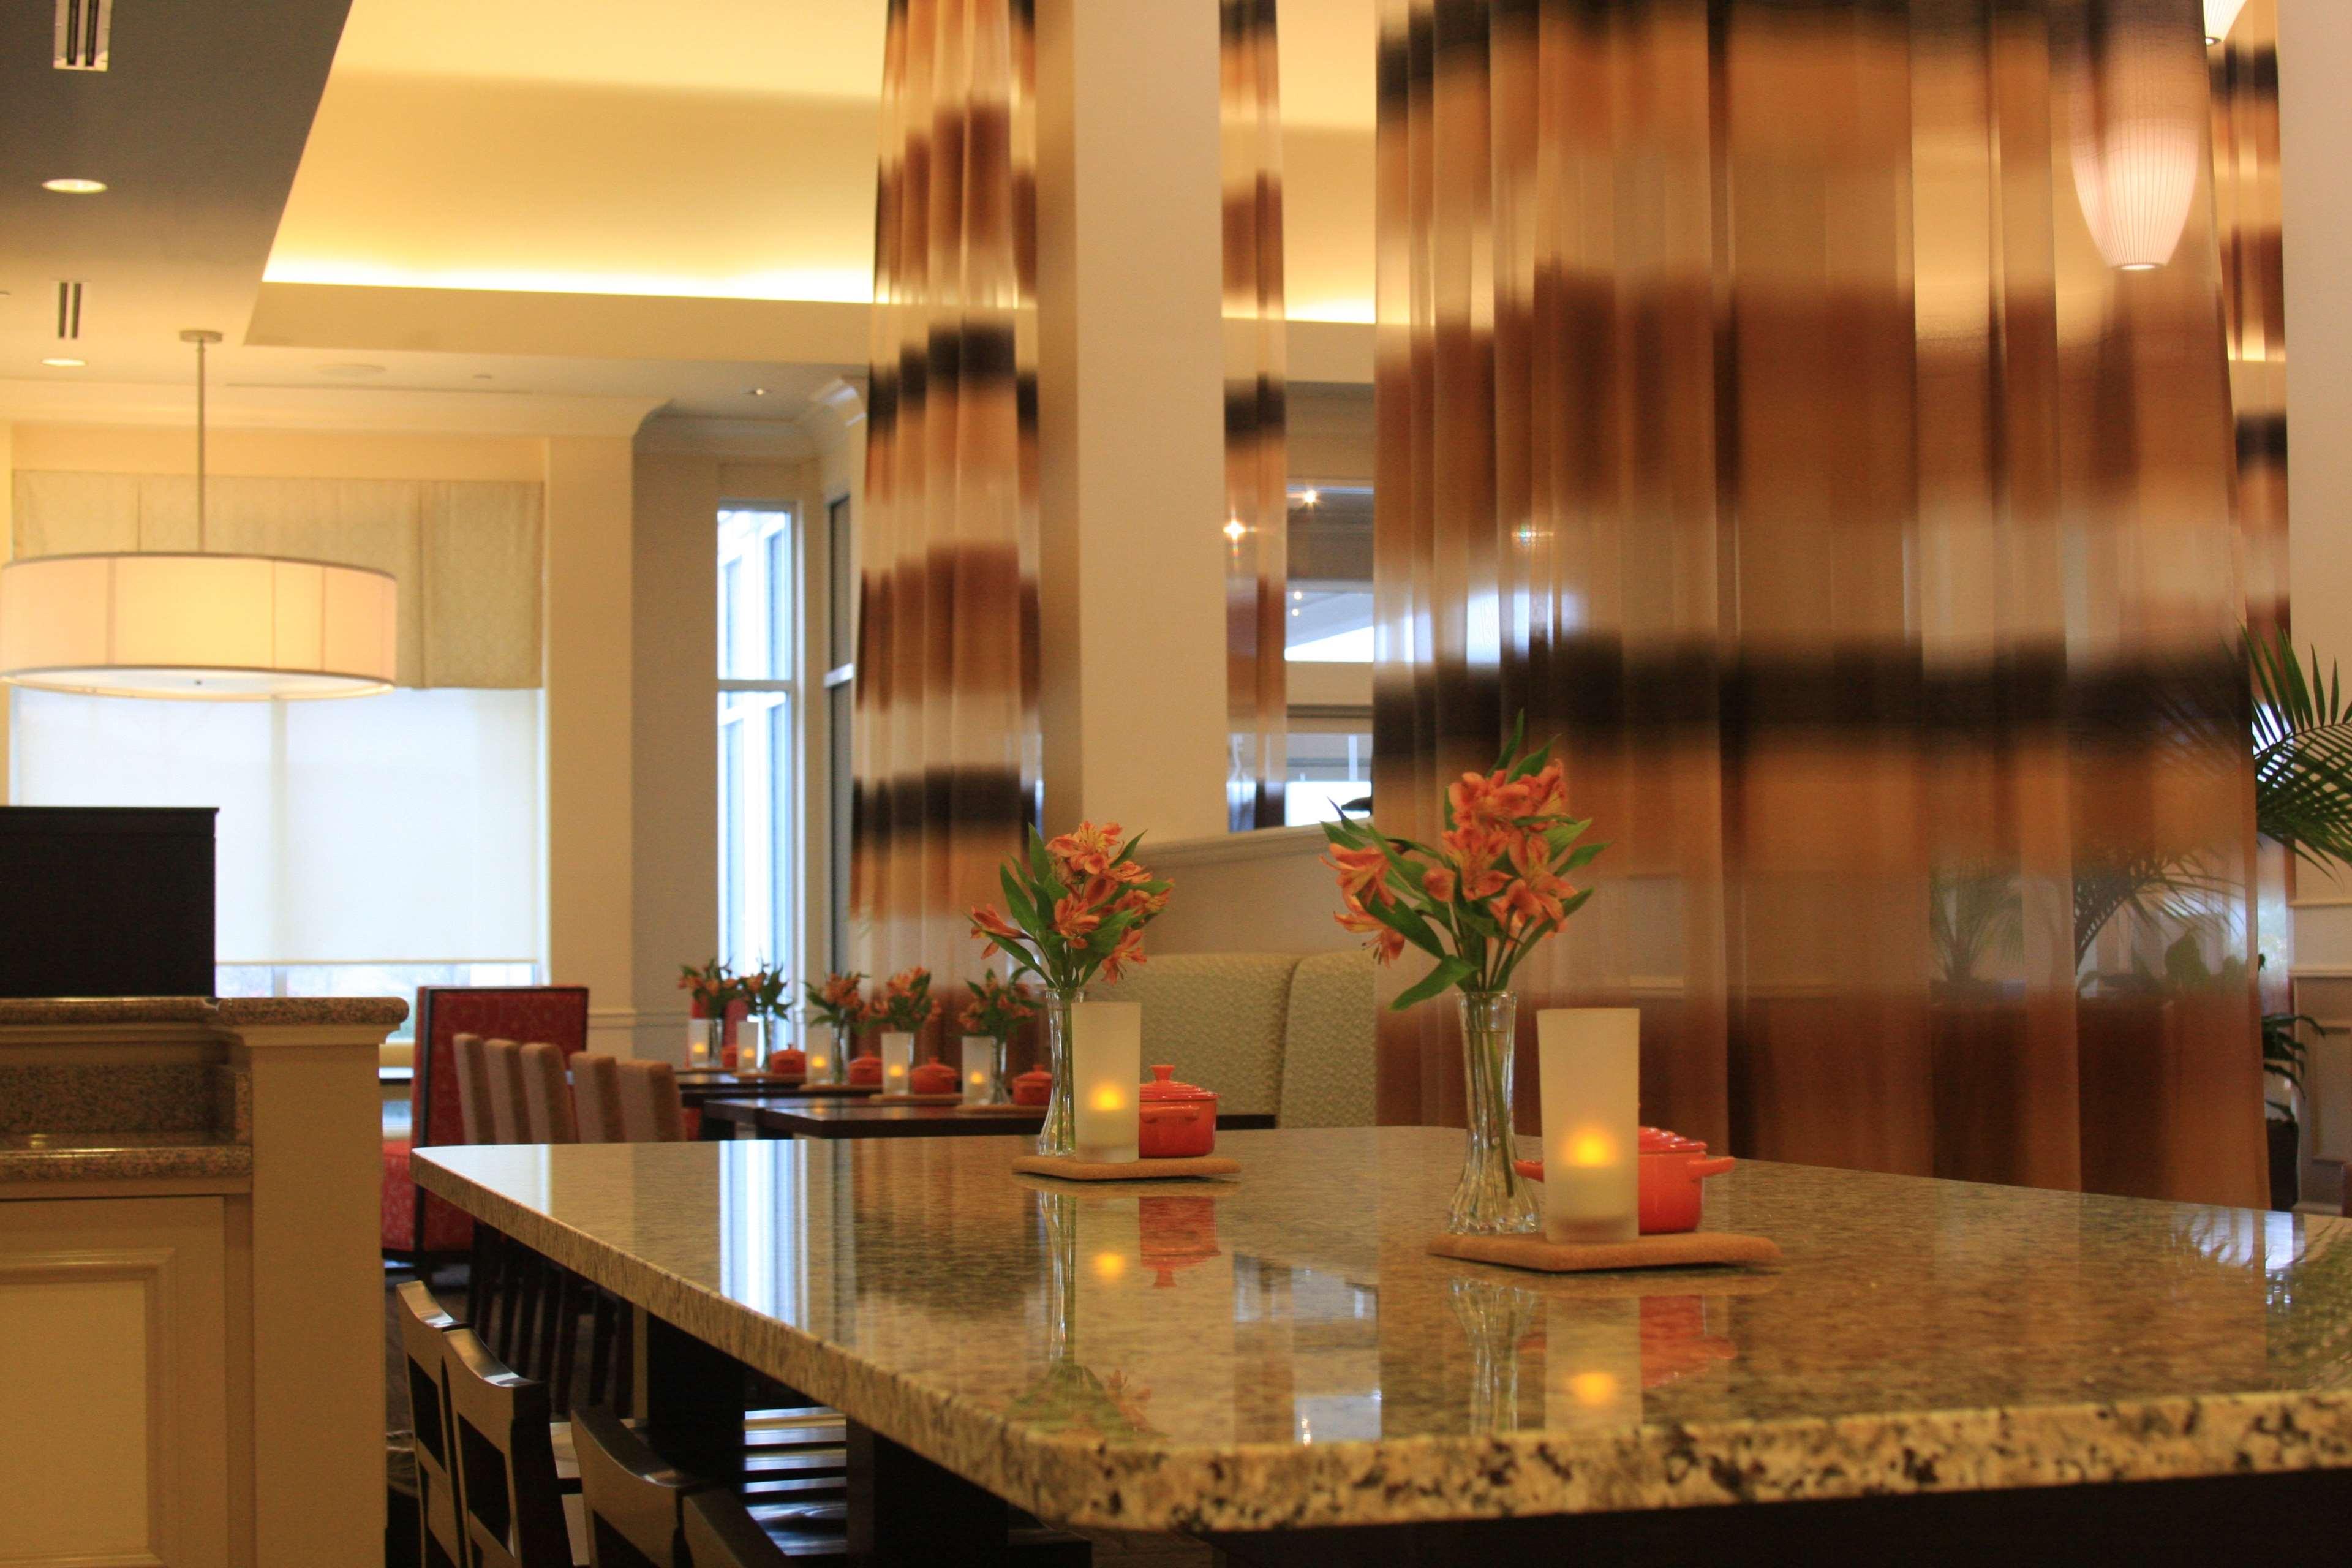 Hilton Garden Inn Elmira/Corning image 18